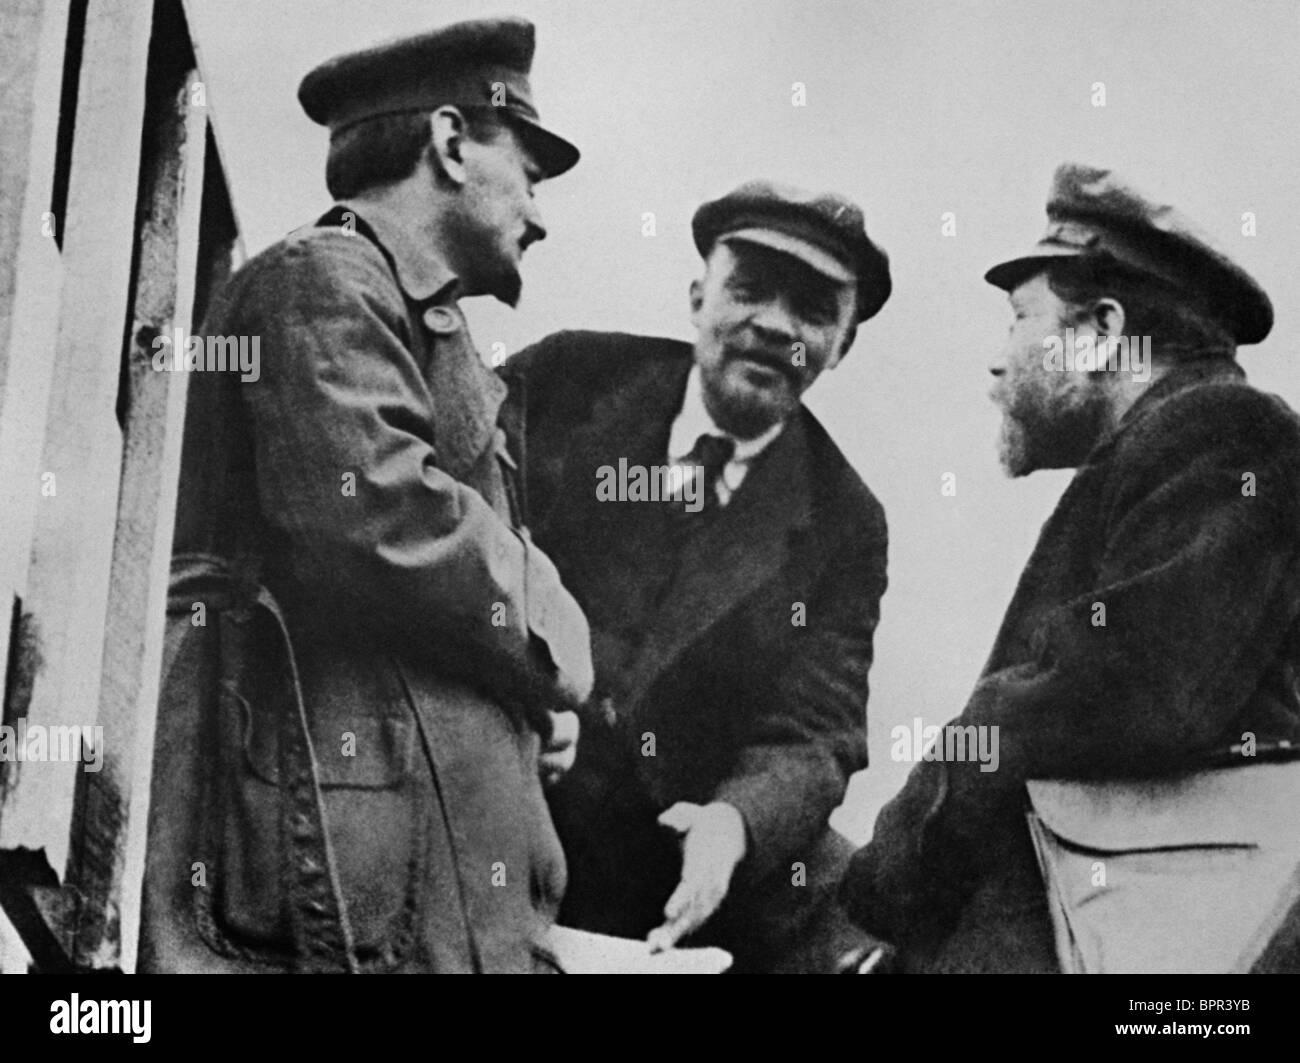 vladimir lenin and leon trotsky relationship quizzes